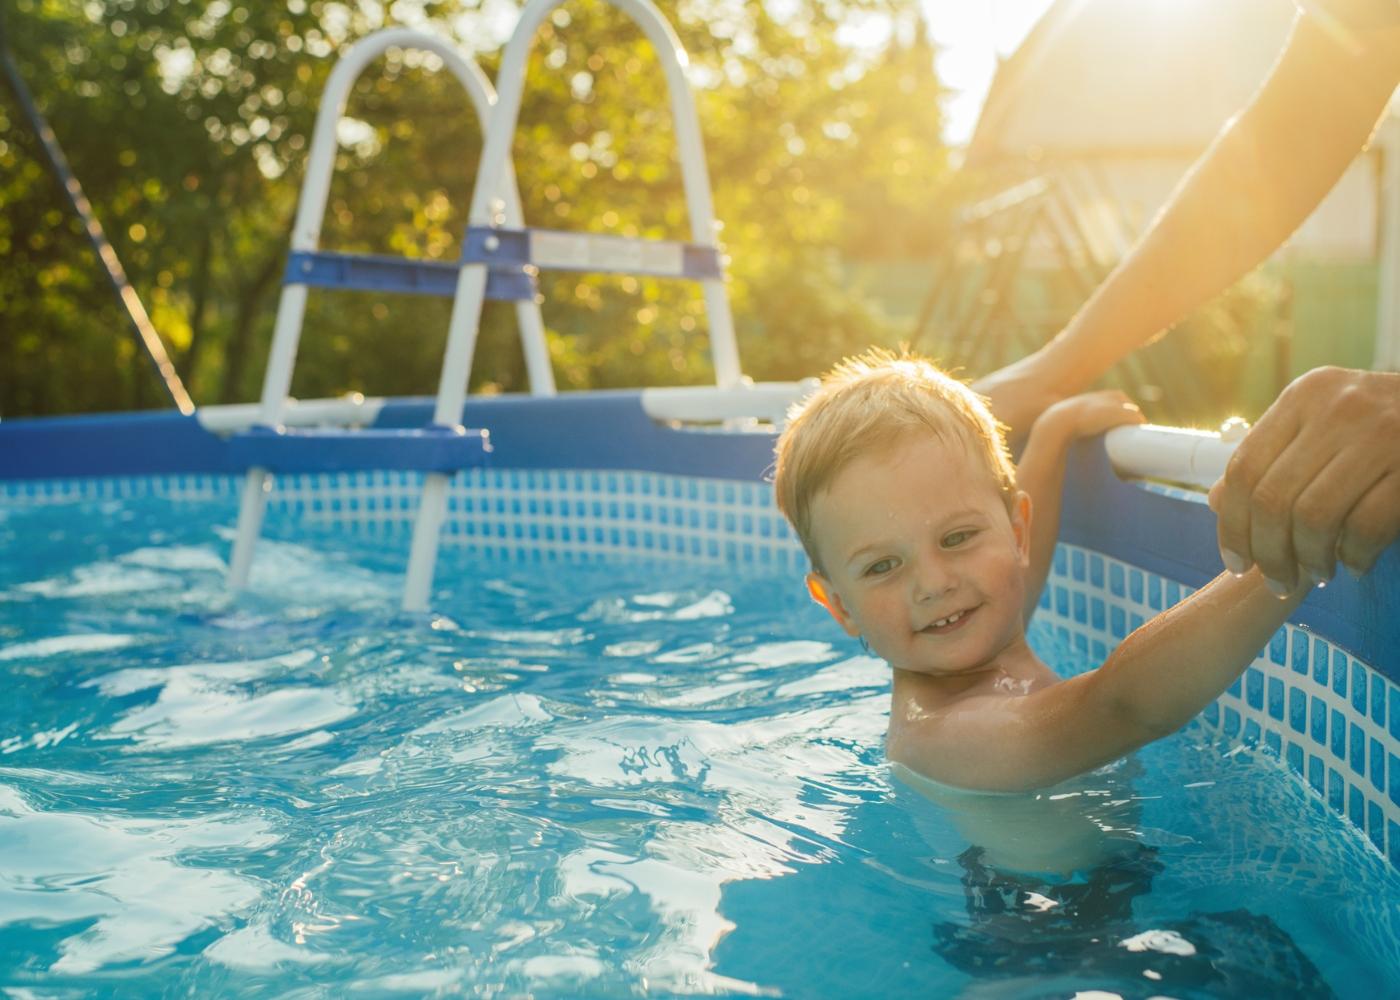 Menino a divertir-se numa piscina desmontável